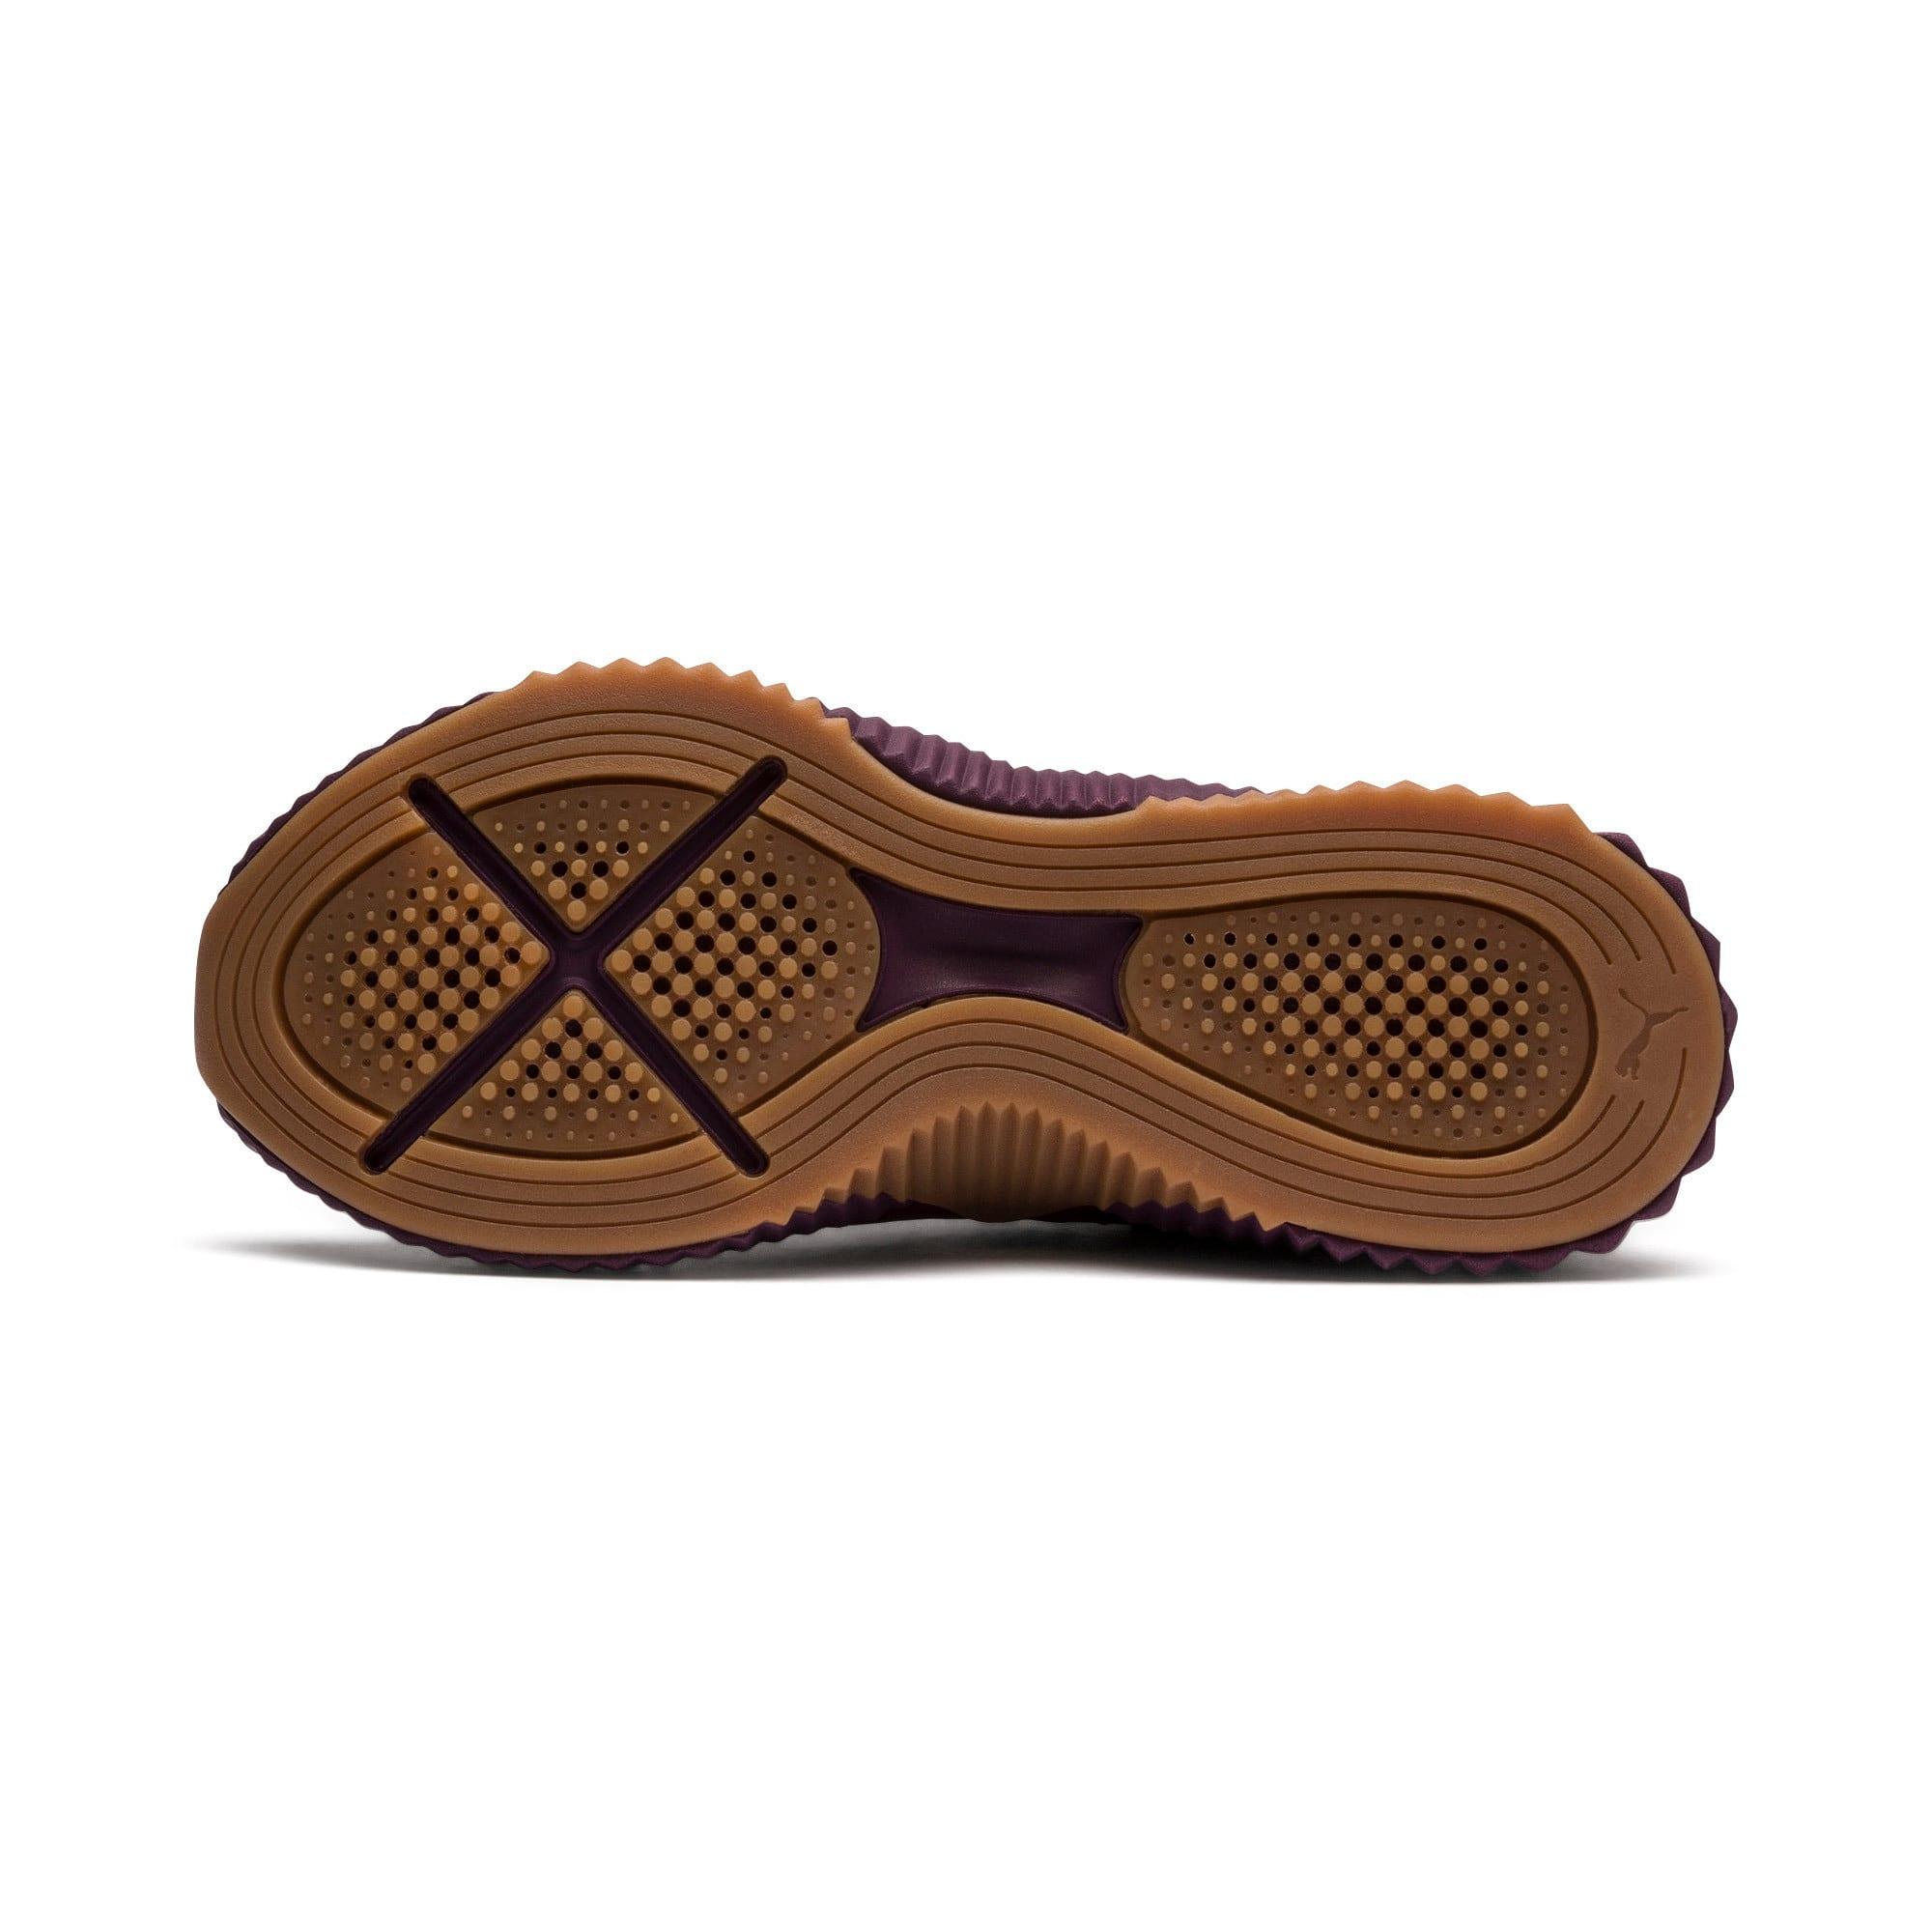 Thumbnail 3 of Defy Luxe Women's Training Shoes, Fig-Metallic Ash, medium